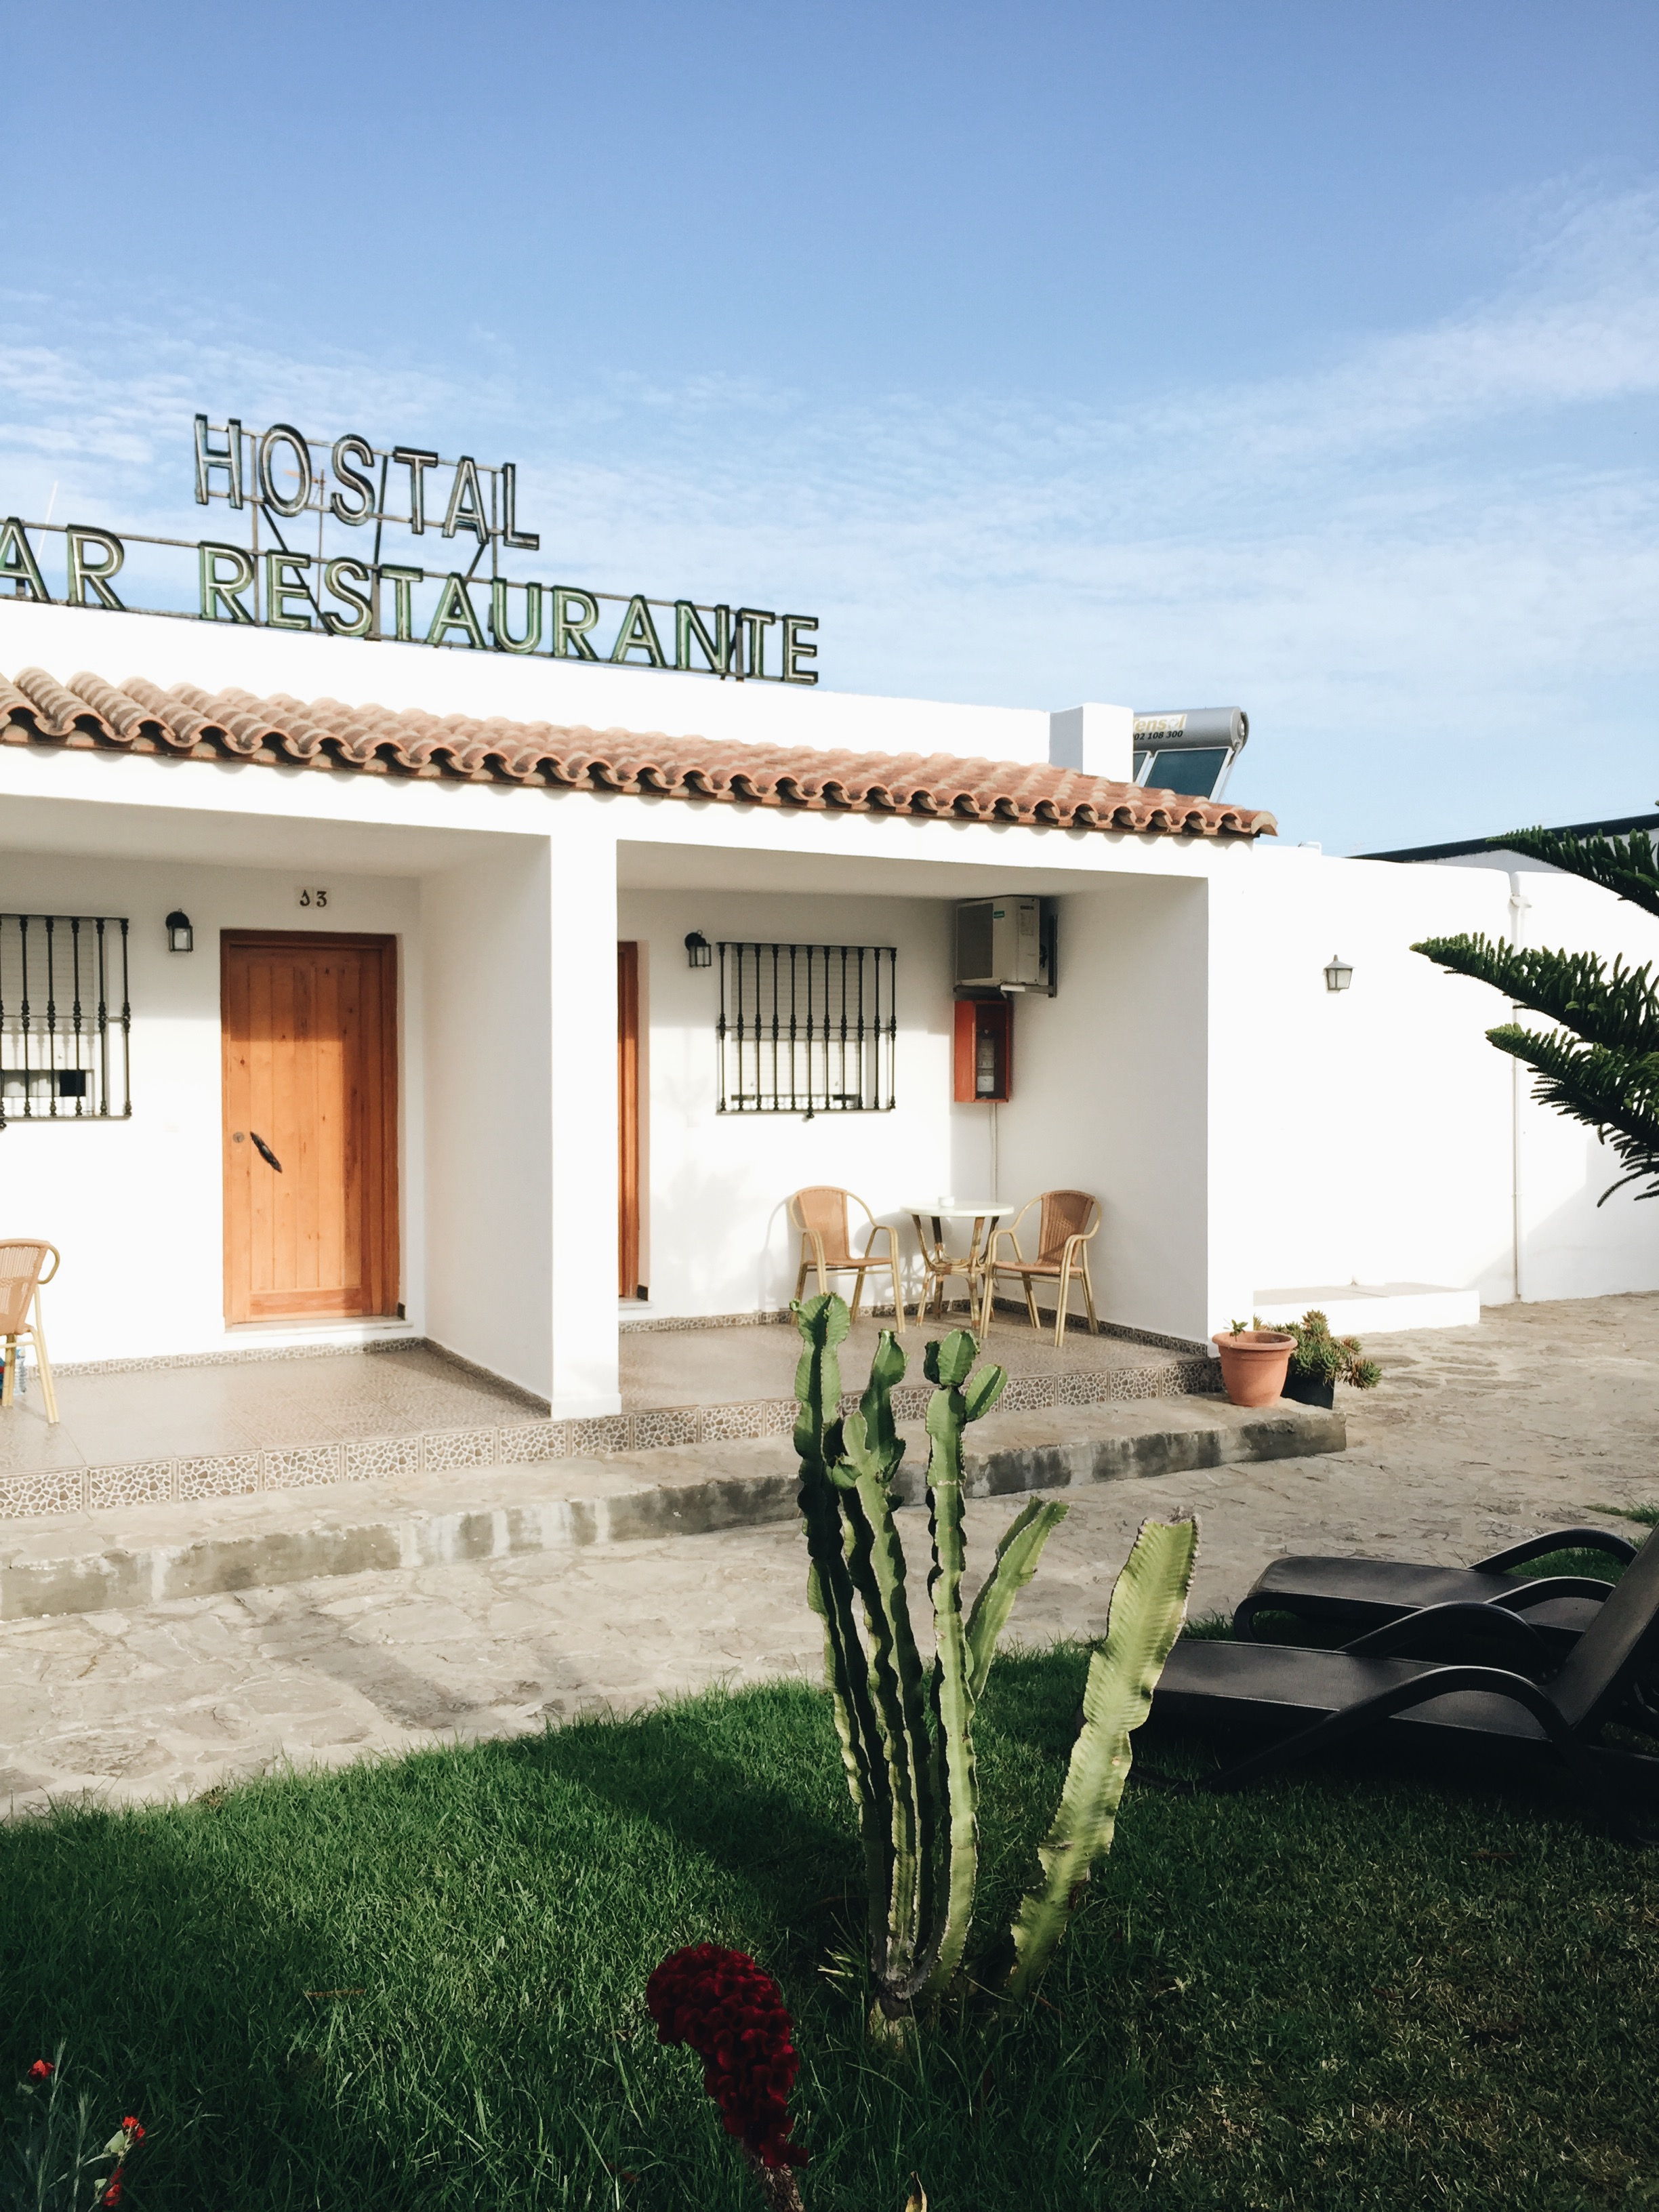 Where to sleep and eat in Tarifa, Spain.